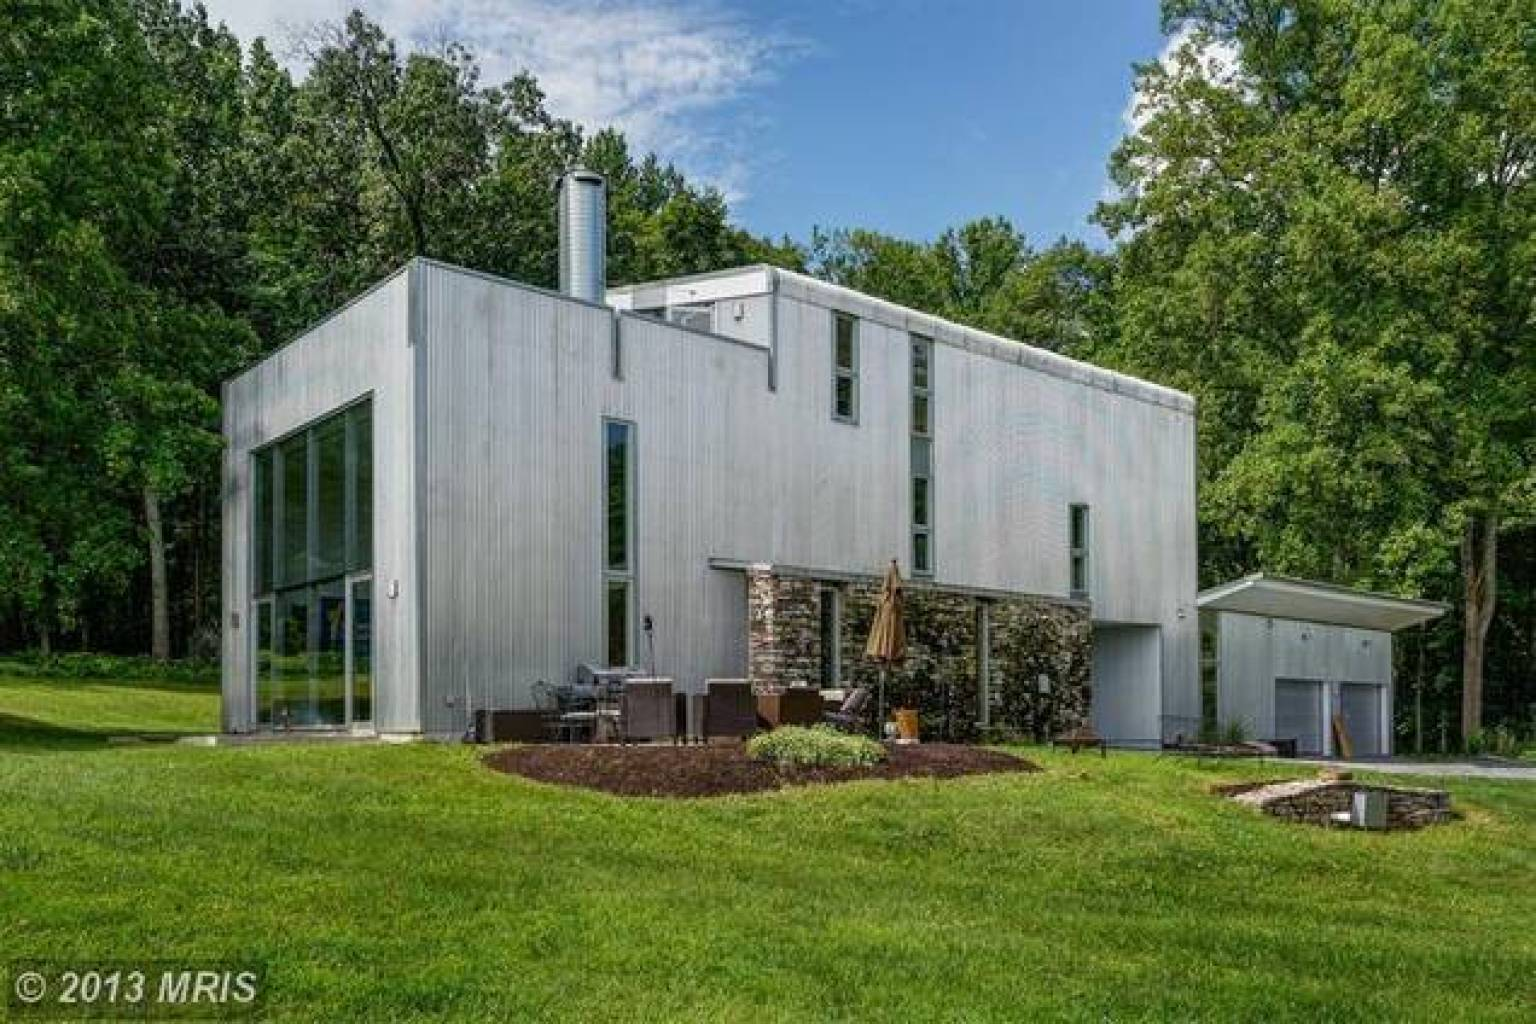 Contemporary home for sale dallas modern homes for sale for Modern homes for sale in virginia